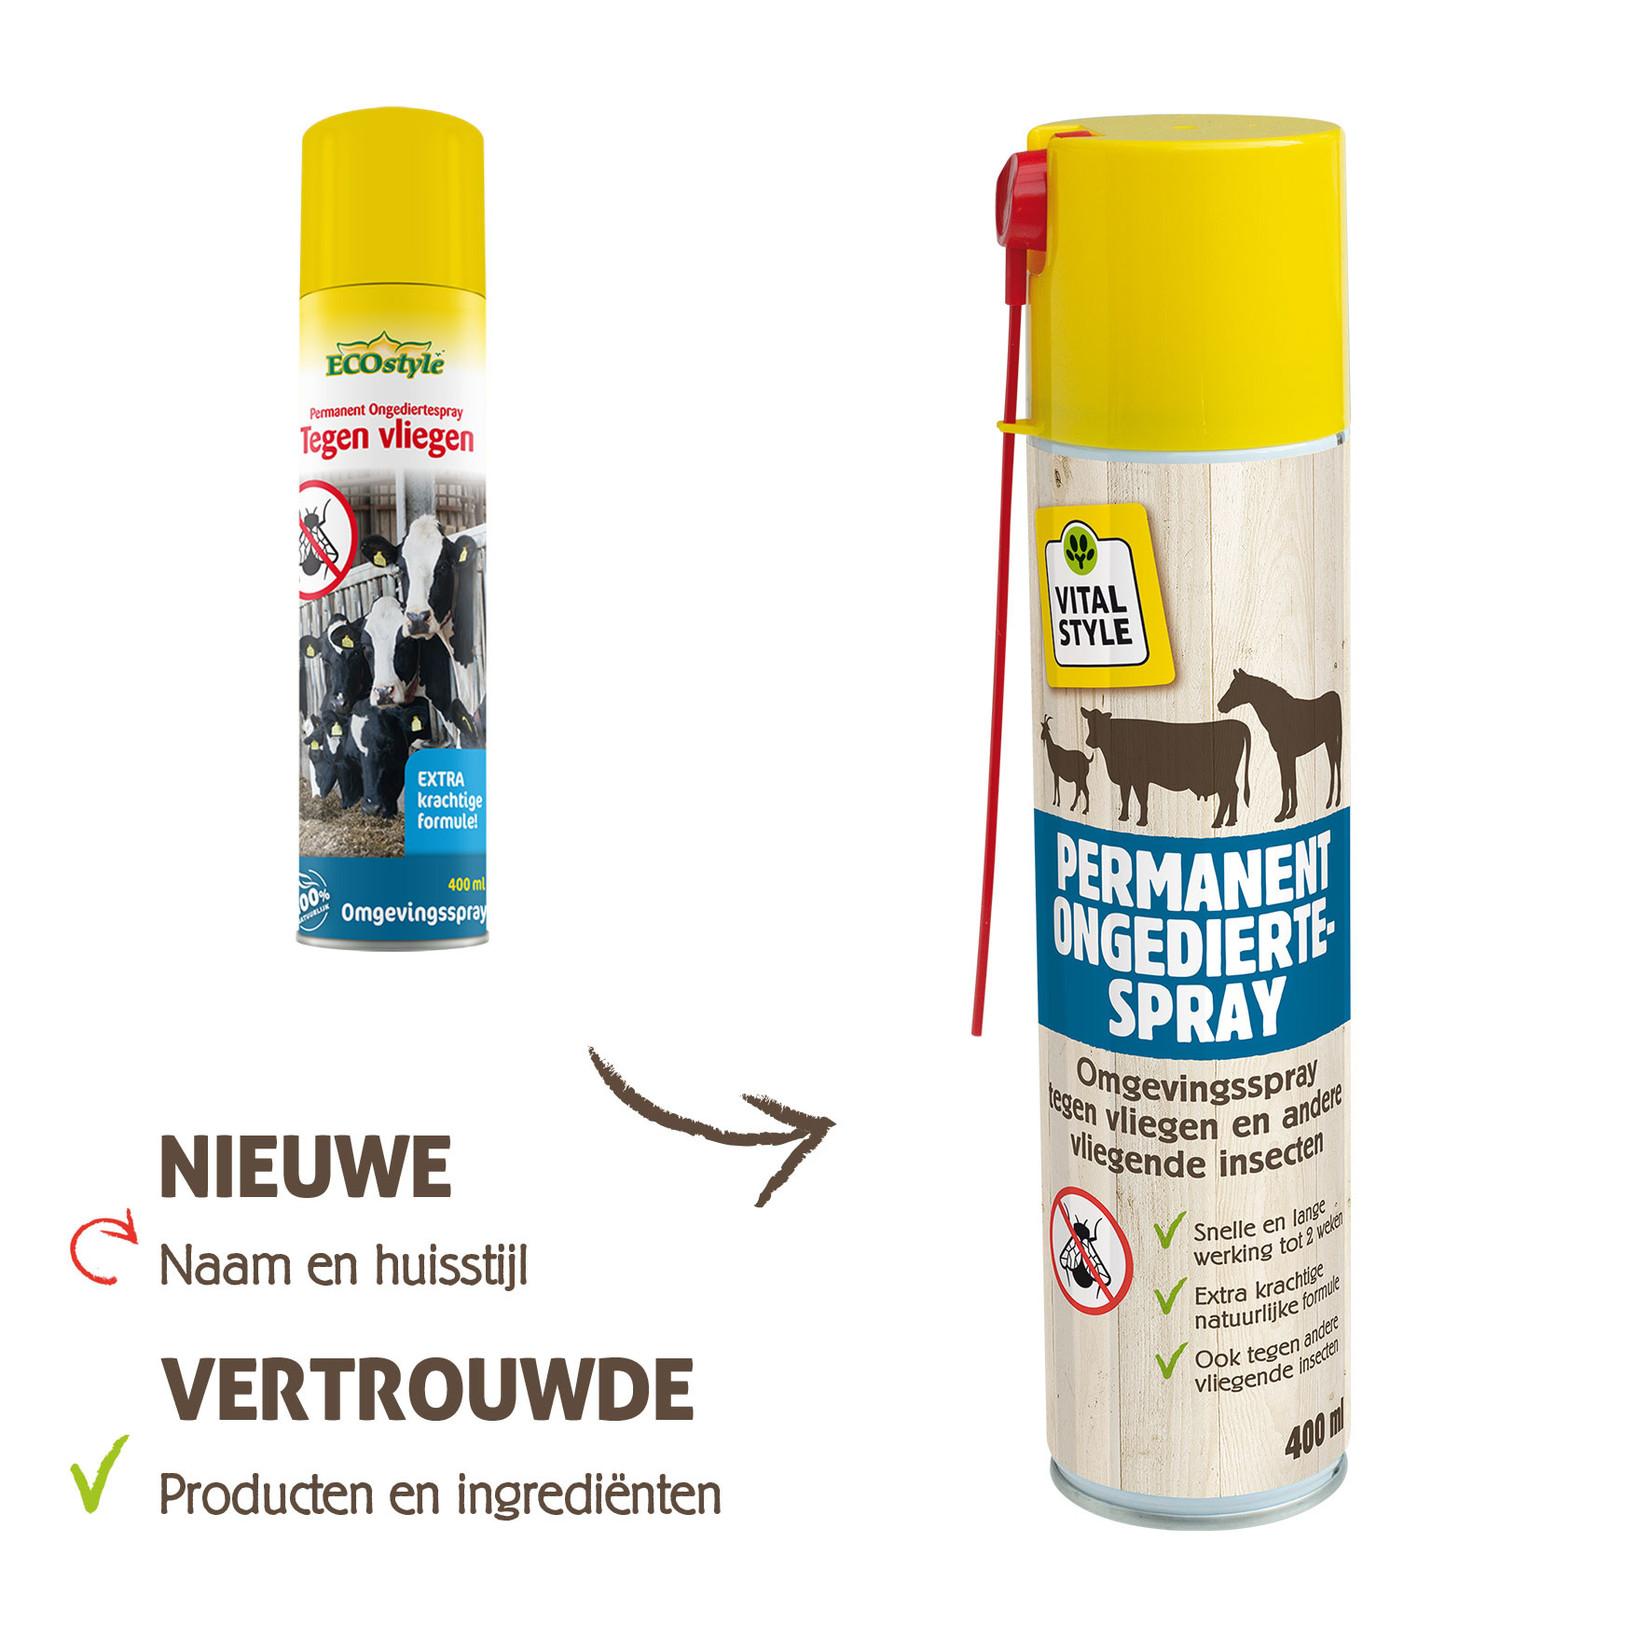 VITALstyle Permanent Ongediertespray 400 ml